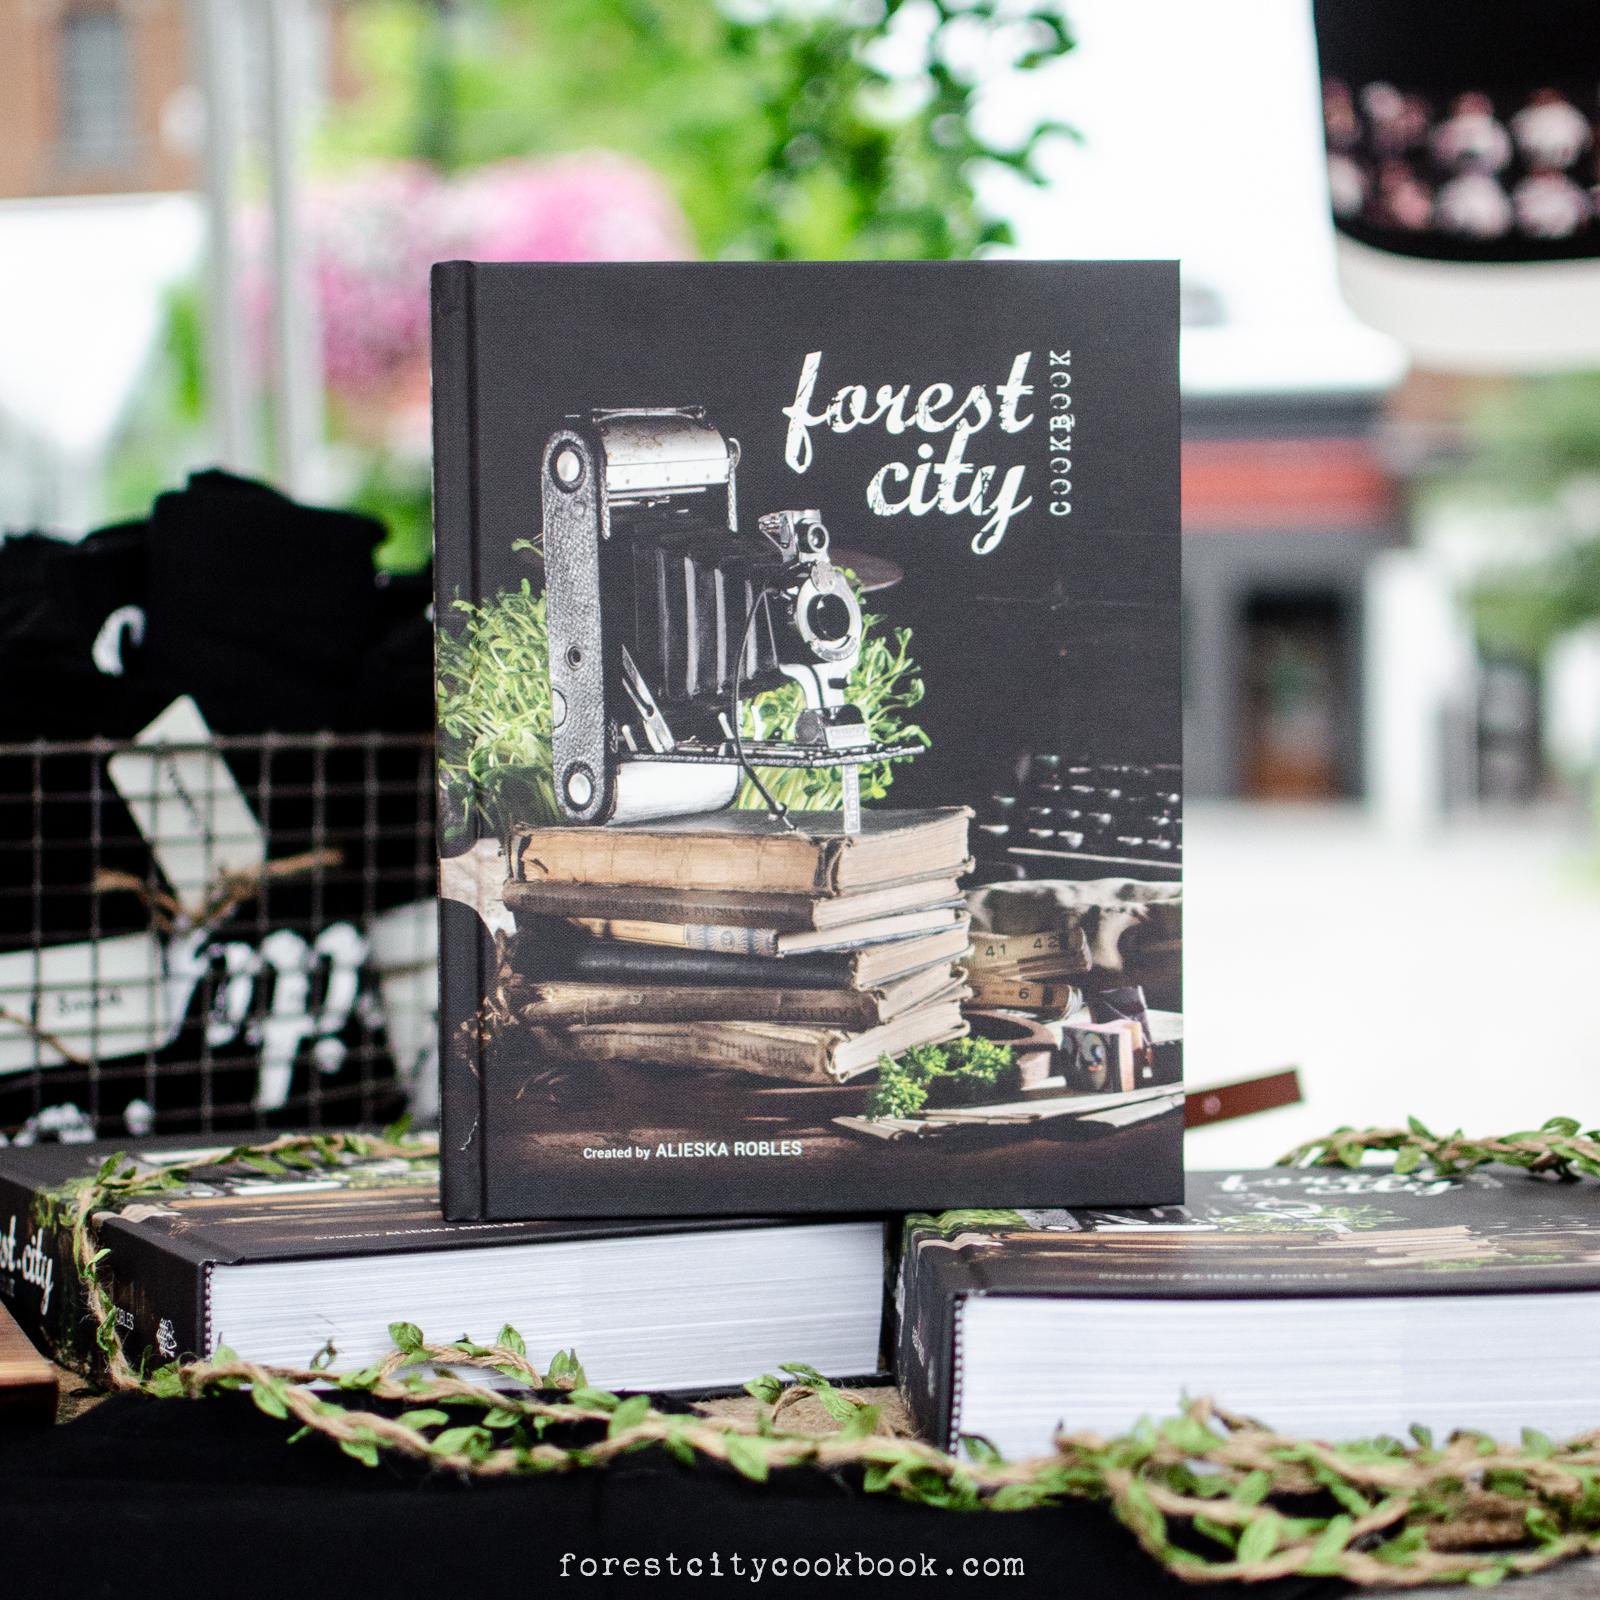 Forest City Cookbook - London Ontario-0526.jpg